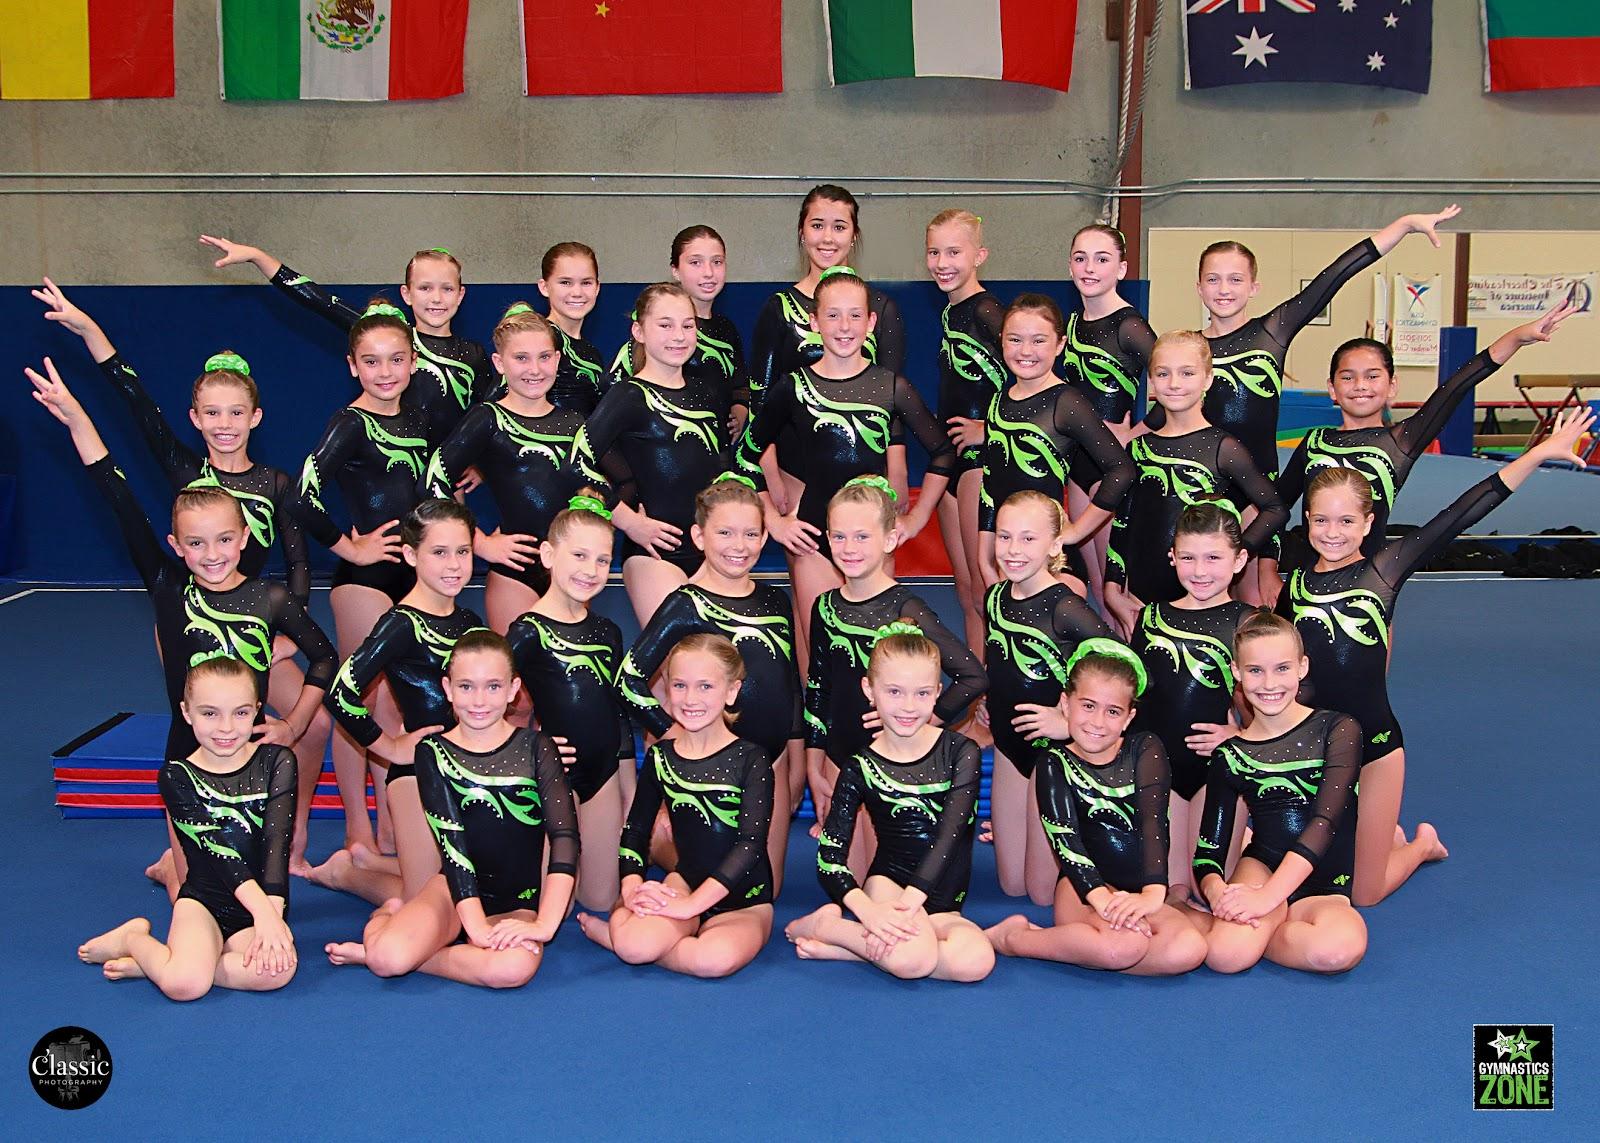 think pink gymnastics meet 2012 results